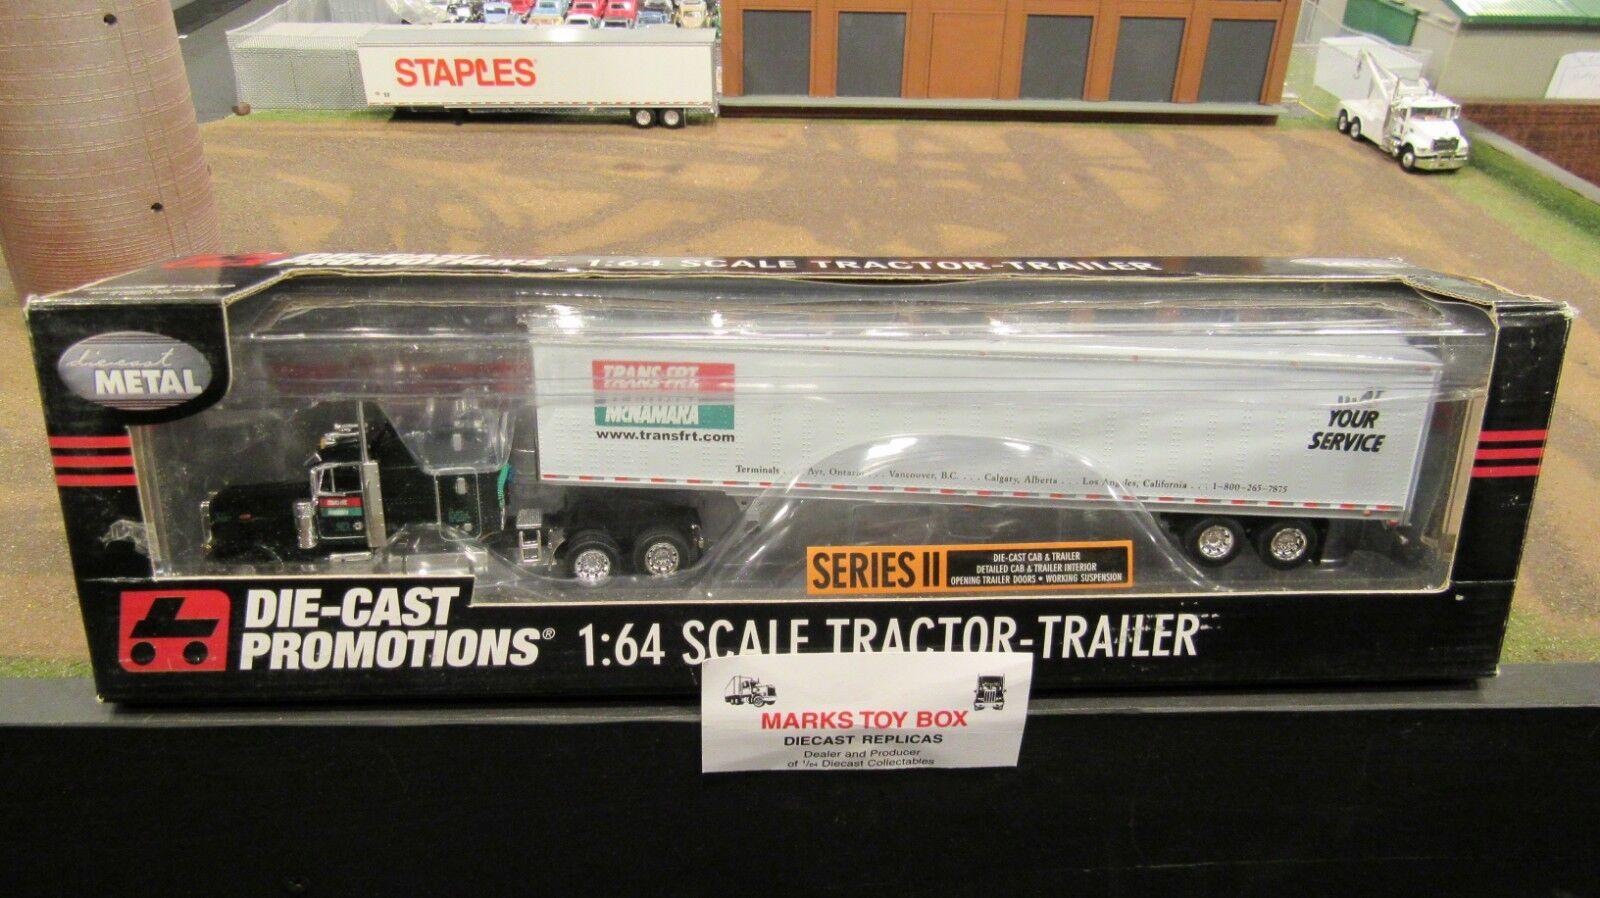 DCPTrans flete McNamara Pete 379 semi camión 53' Dry Van Trailer 1 64 FC